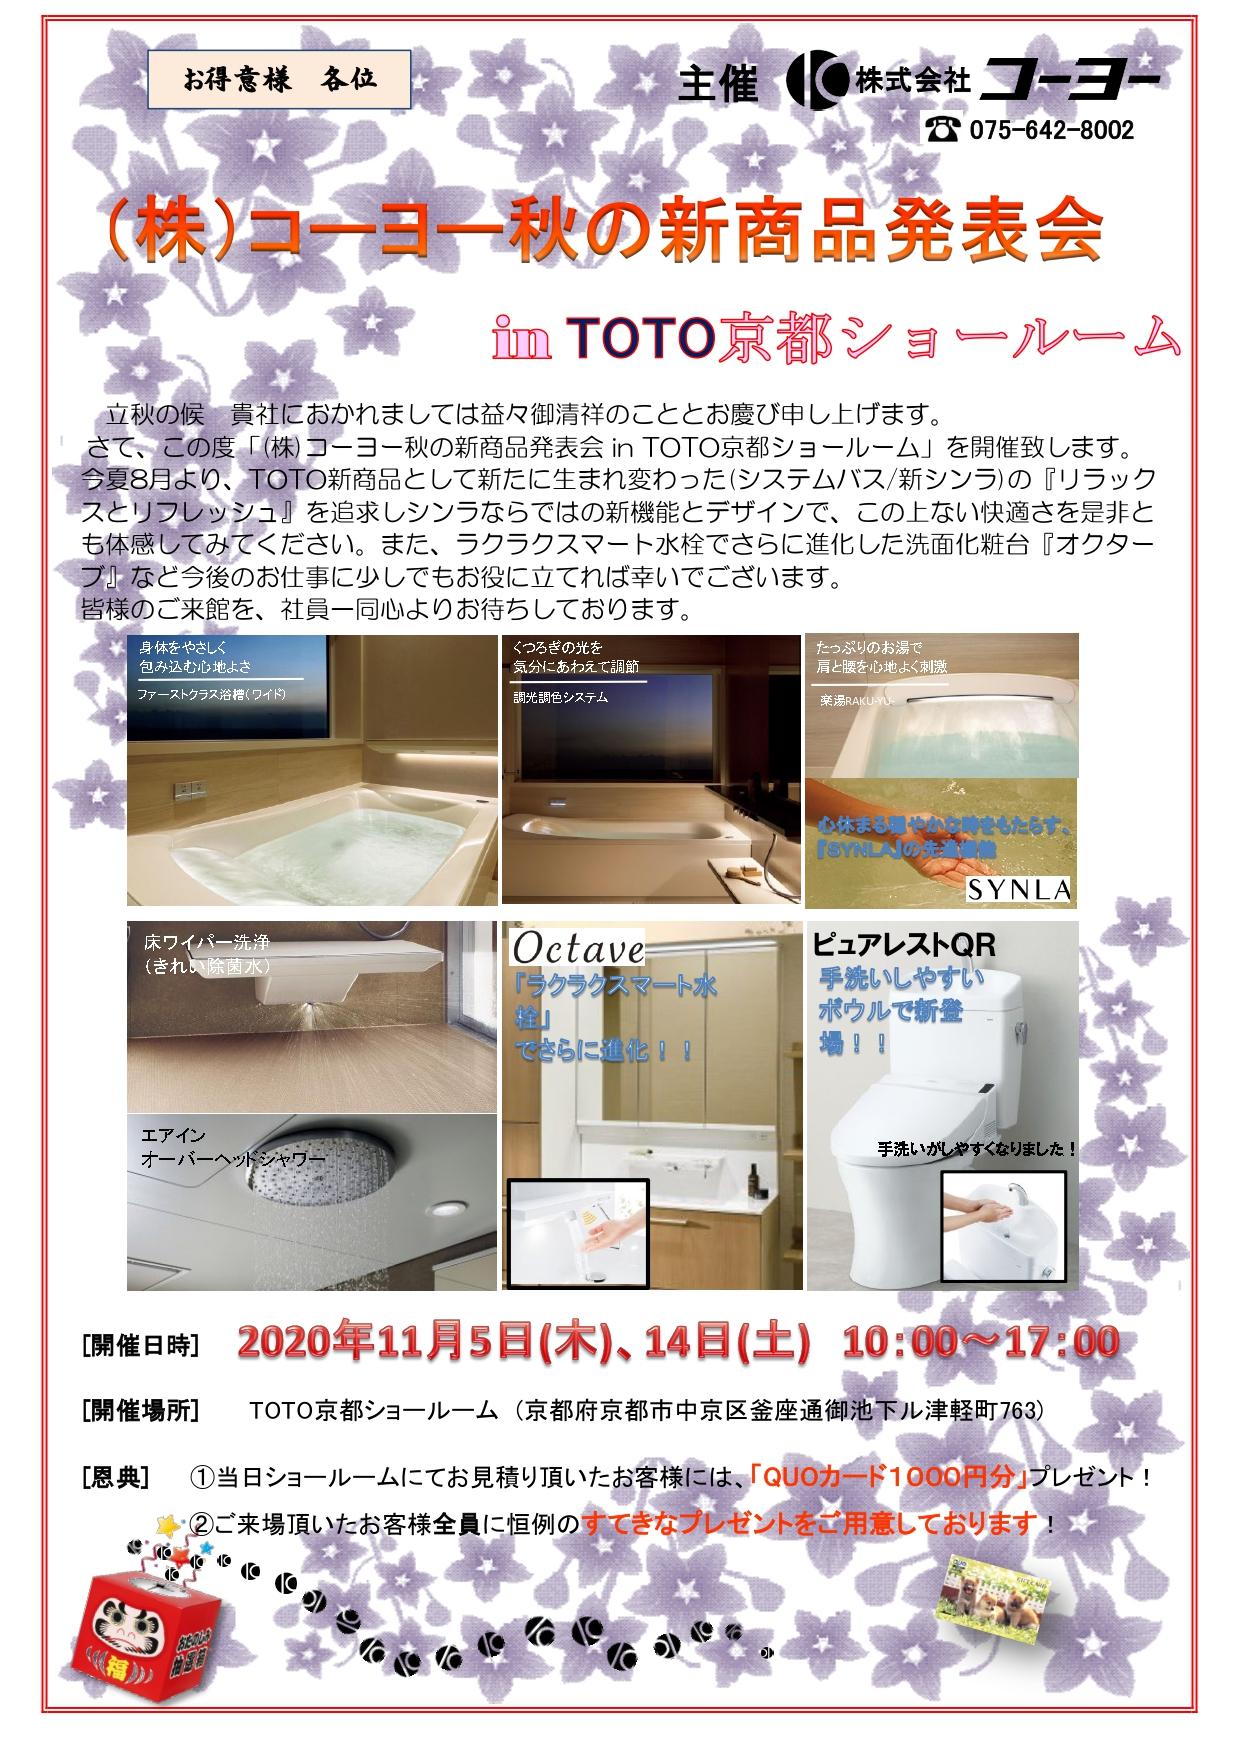 TOTO新商品商談会開催します!